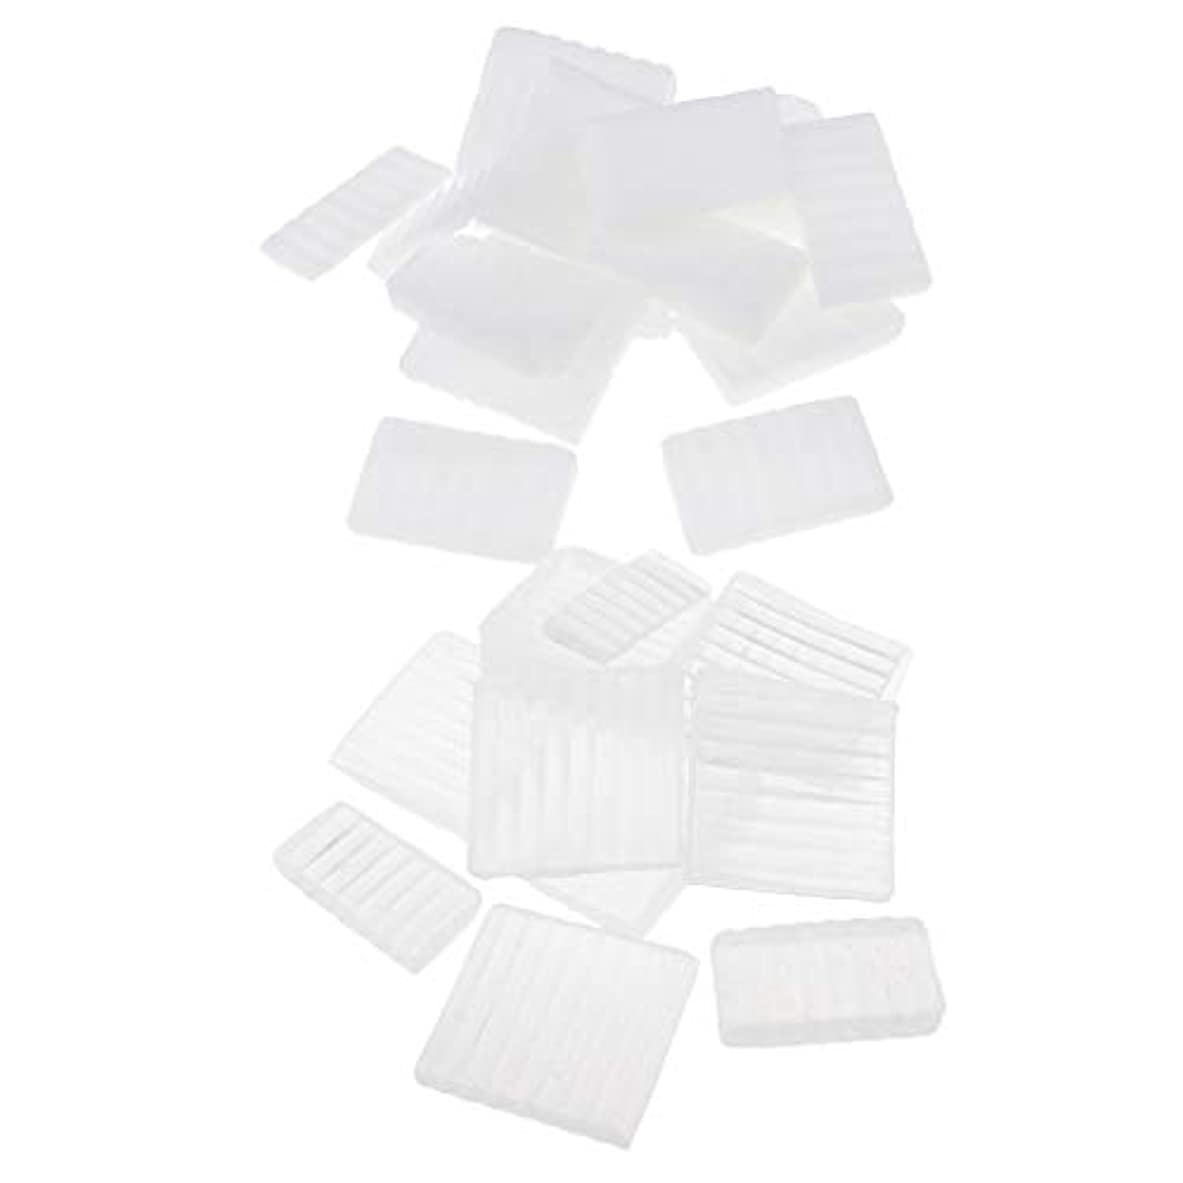 dailymall 石鹸ベース ソープメイキング素材 ソープ グリセリンソープ ハンドメイド 石鹸材料